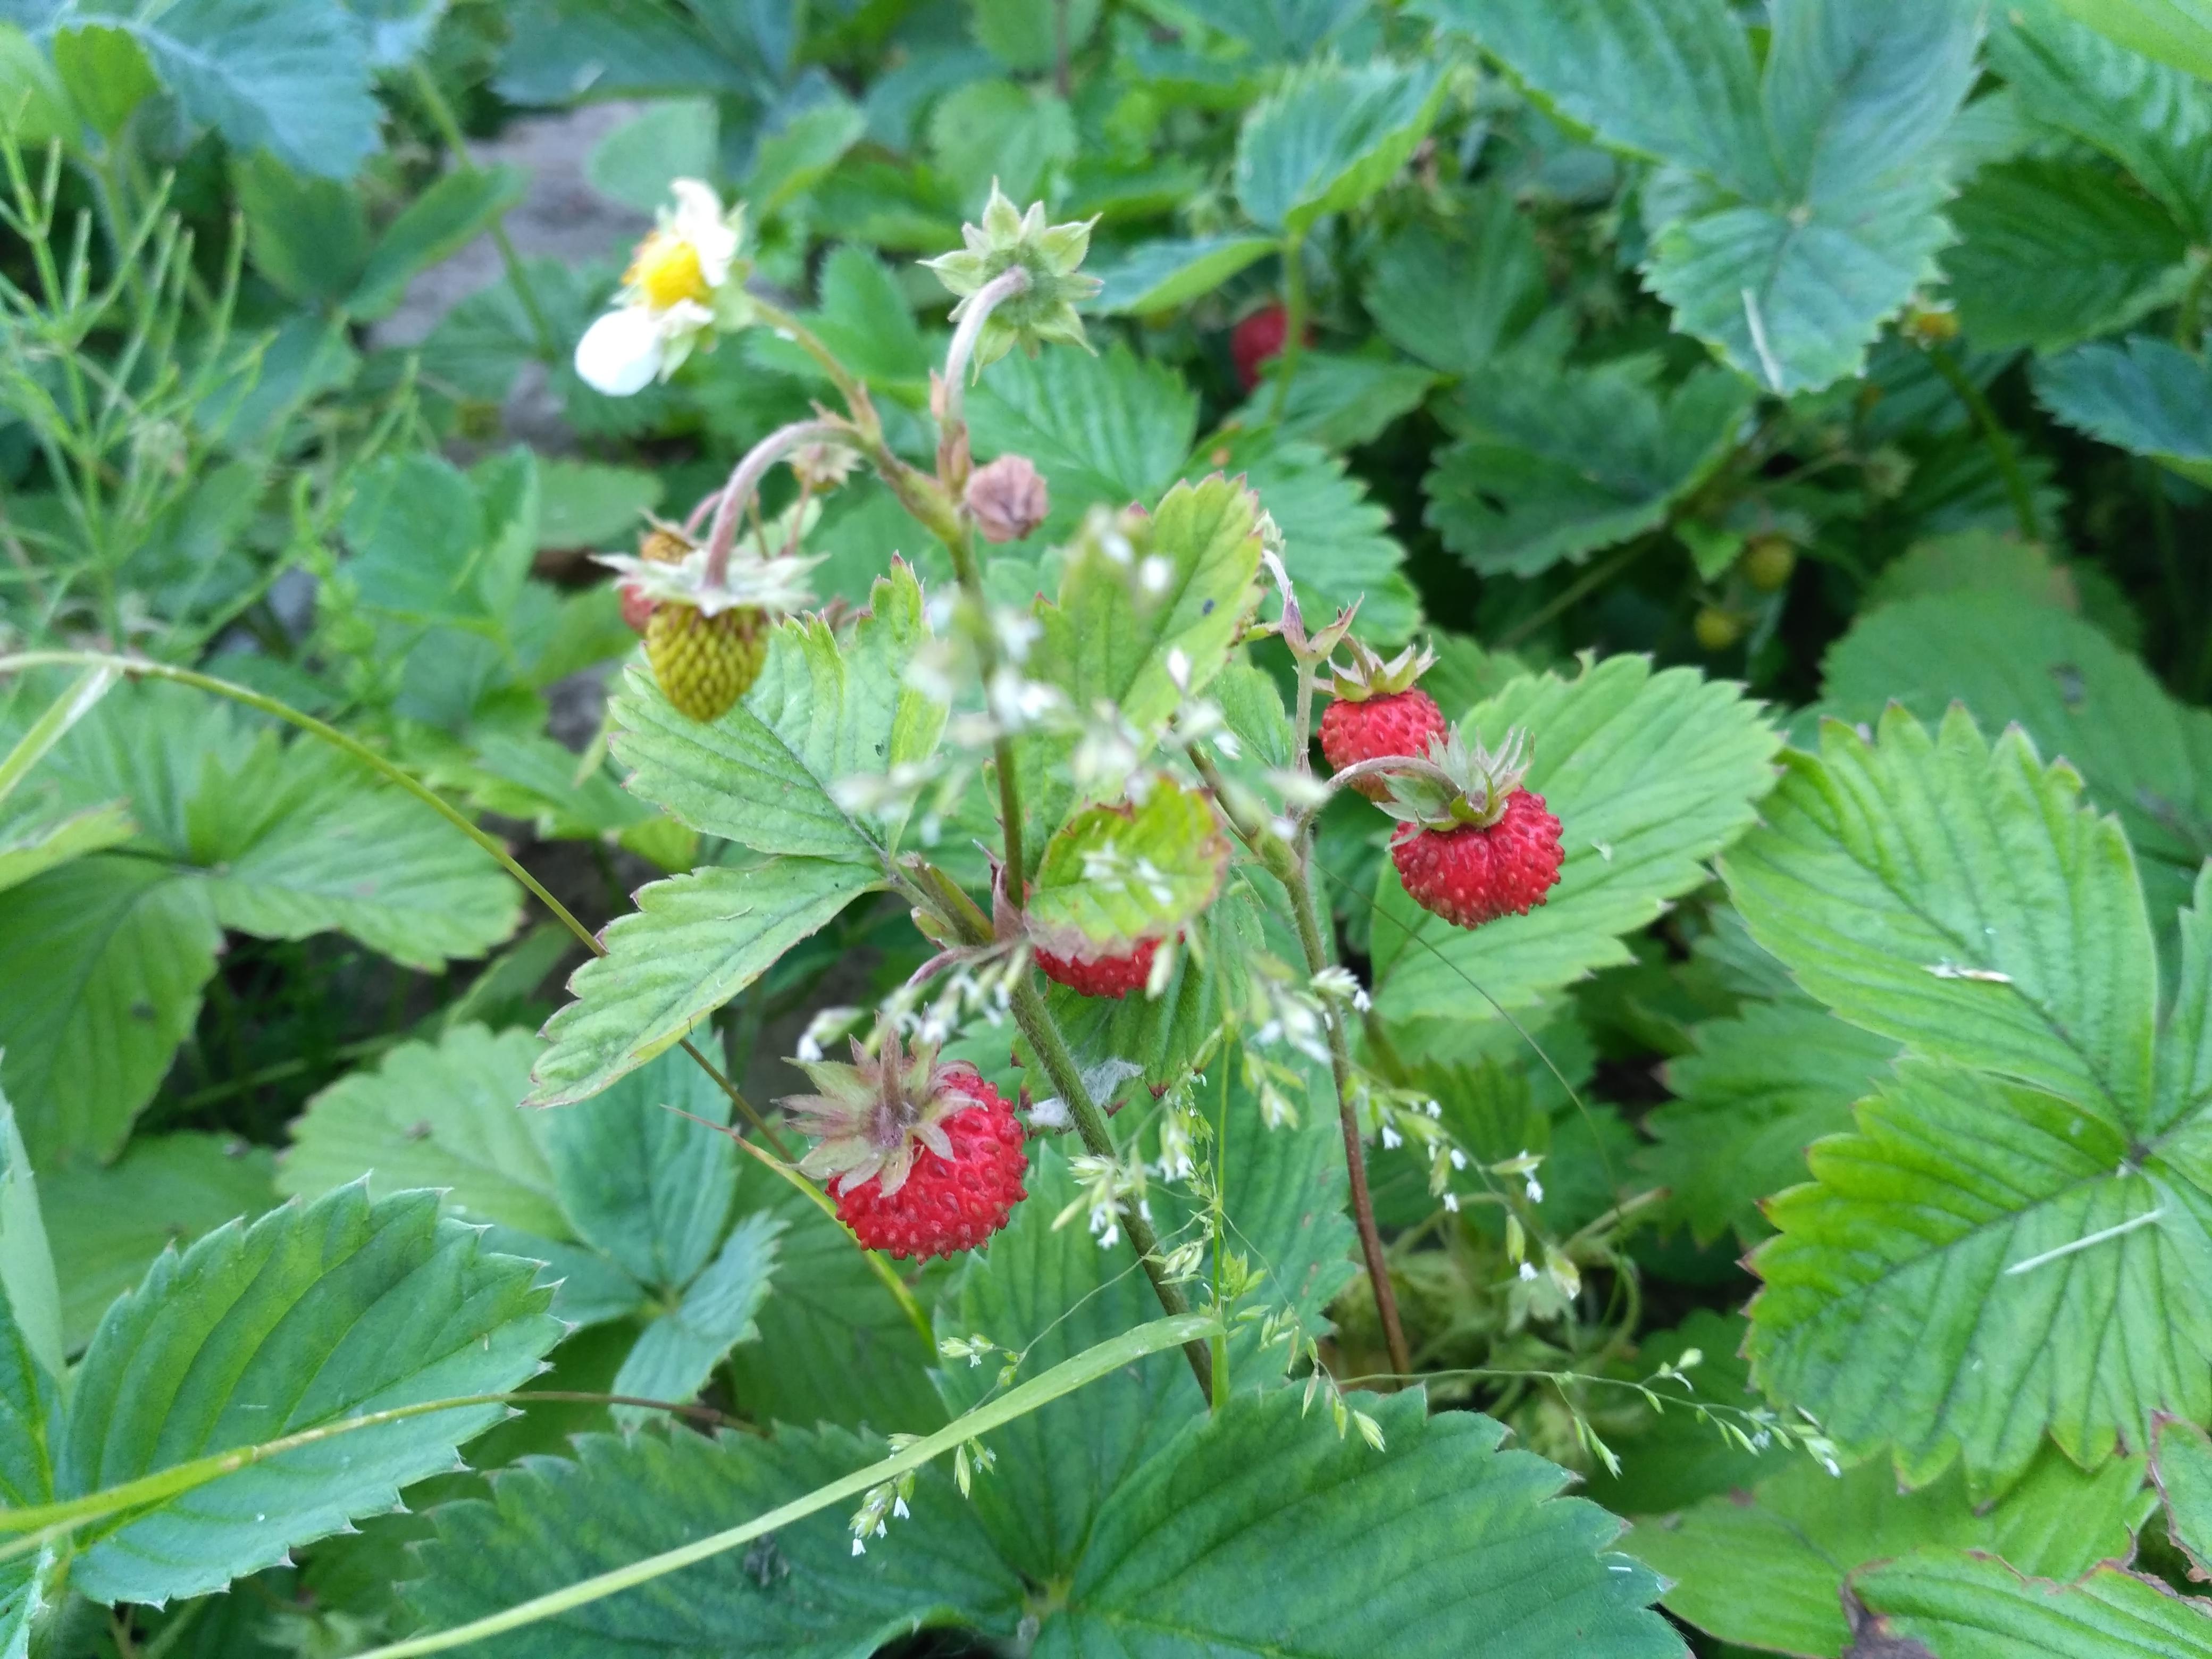 Strawberries, forest berry, Strawberries, forest berry